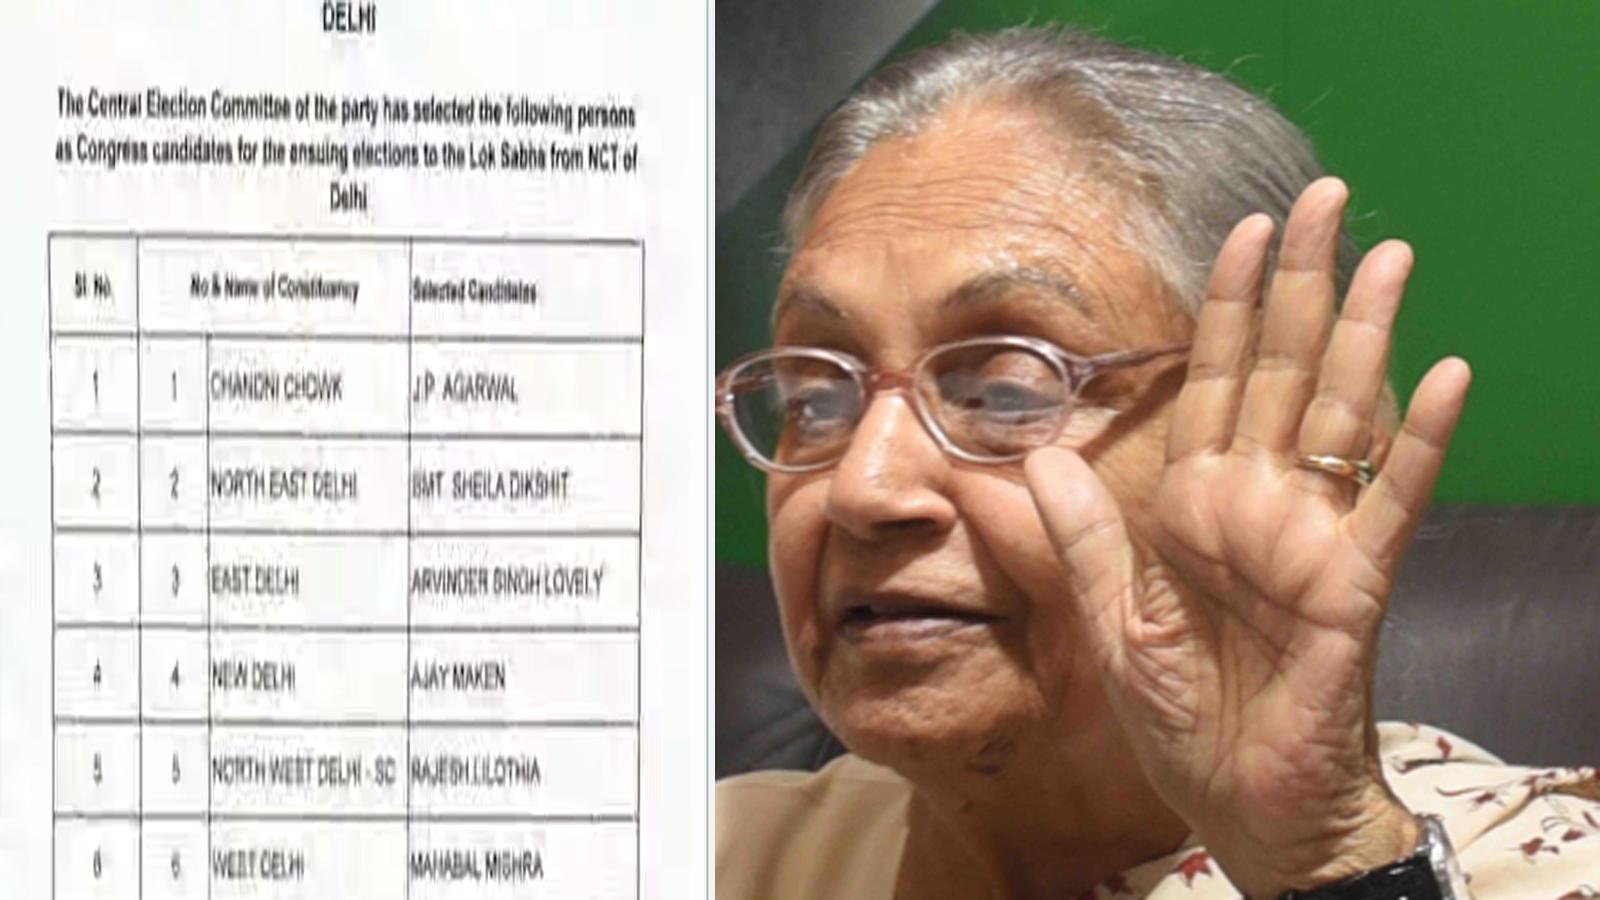 congress-announces-candidates-for-lok-sabha-polls-in-delhi